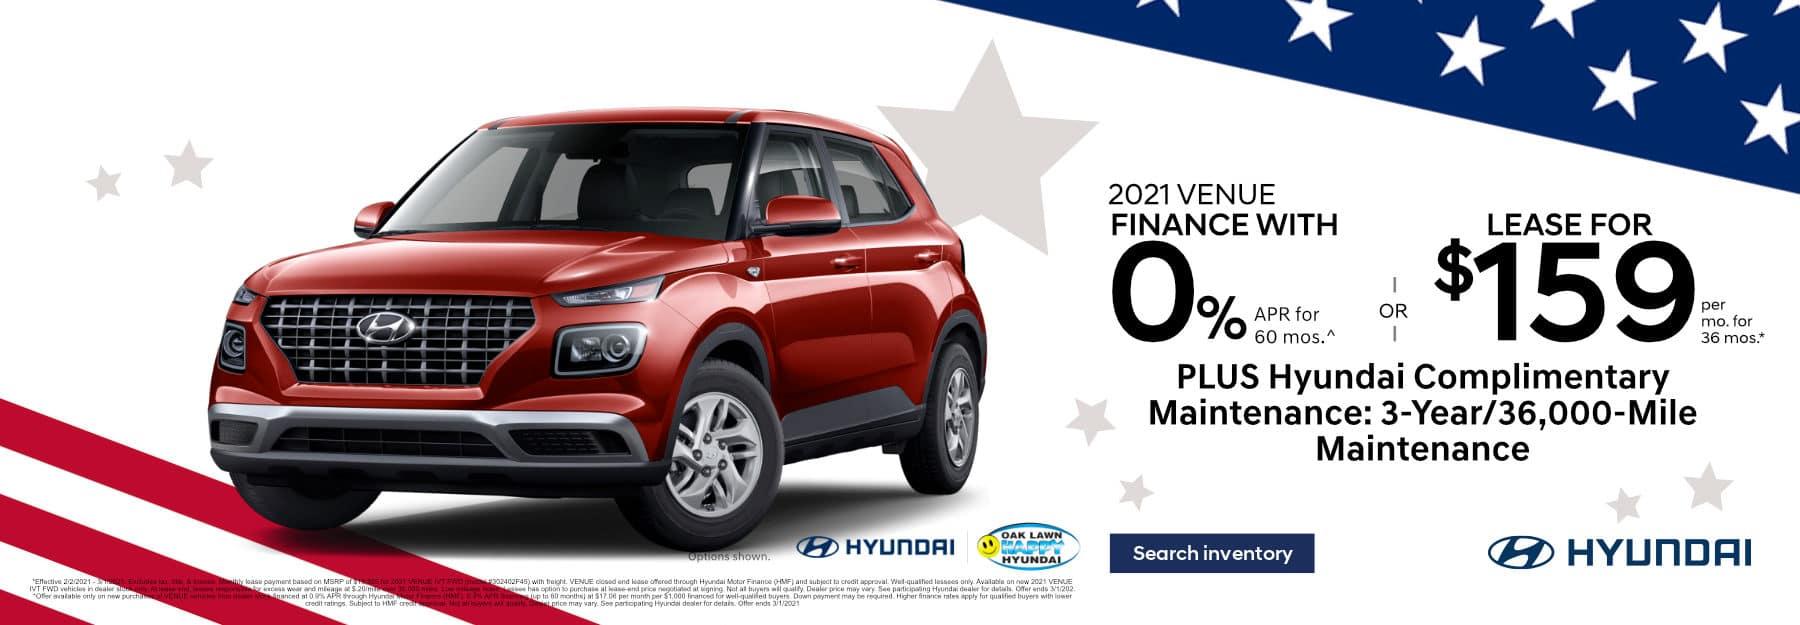 FEBRUARY_2021_VENUE_Happy_Hyundai